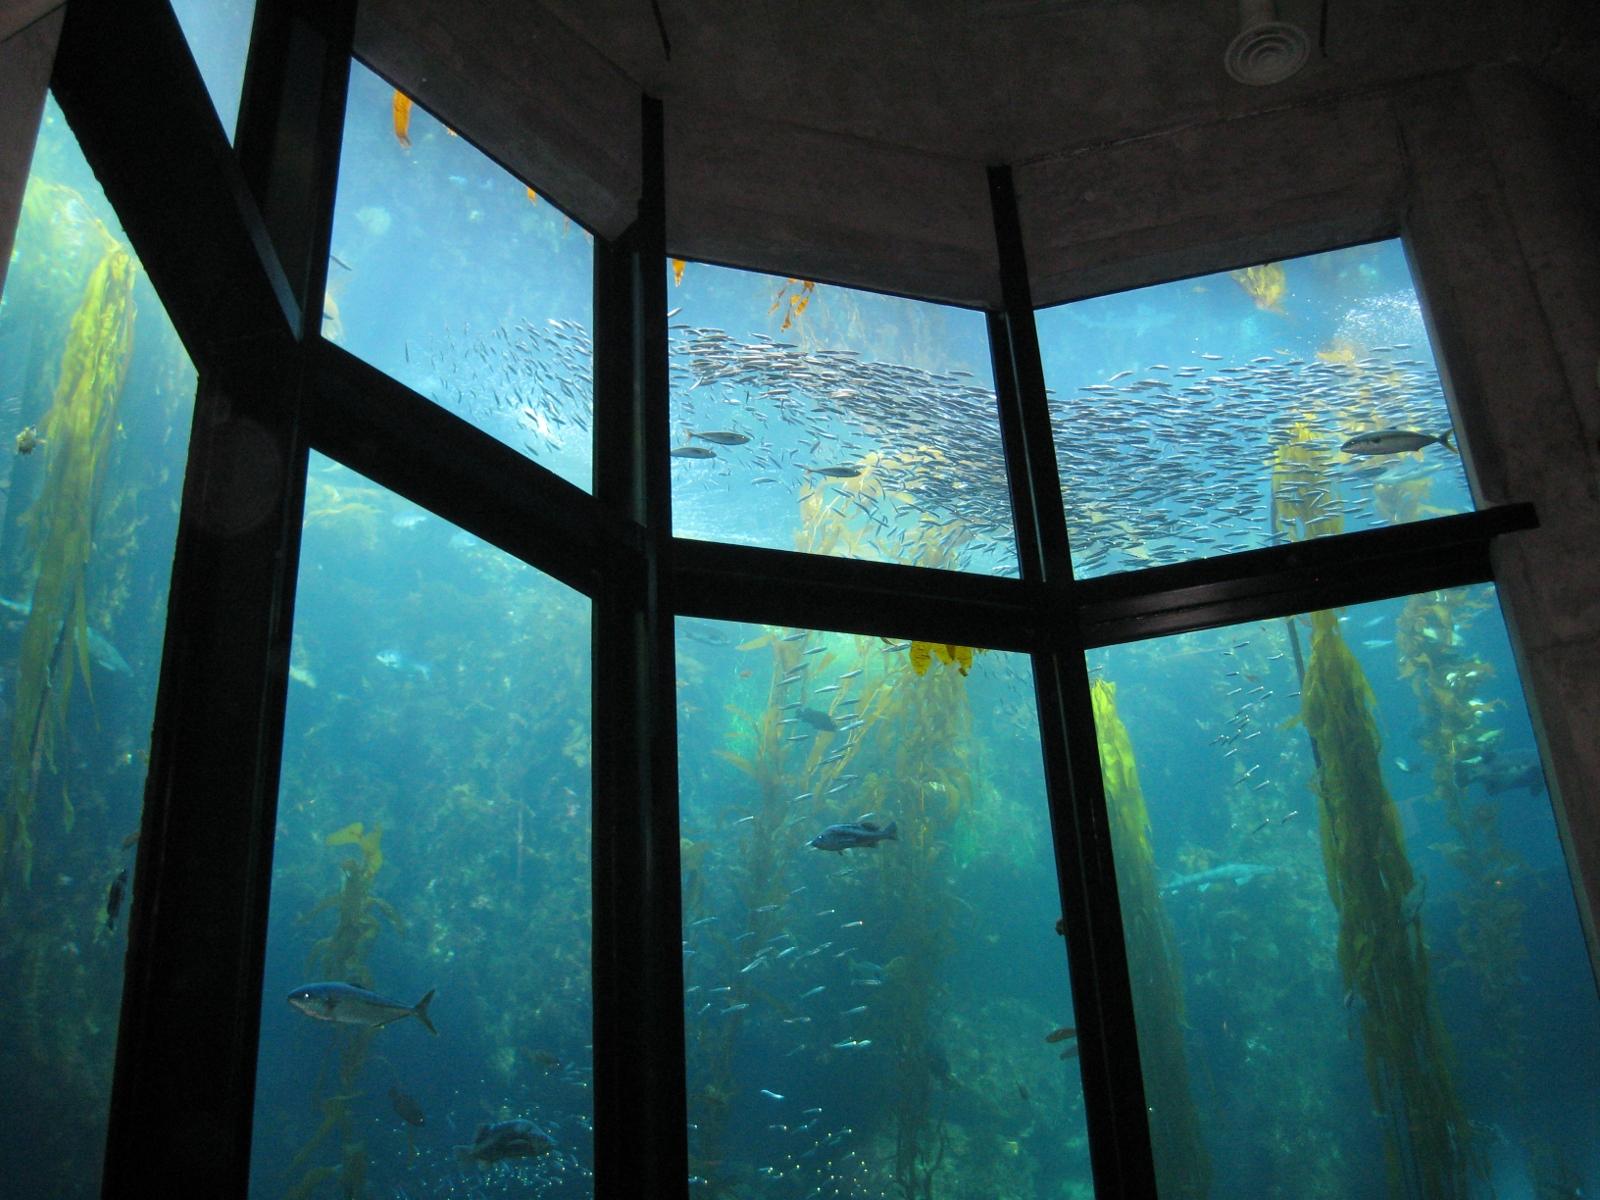 Kelp Forest At The Monterey Bay Aquarium Places To Go